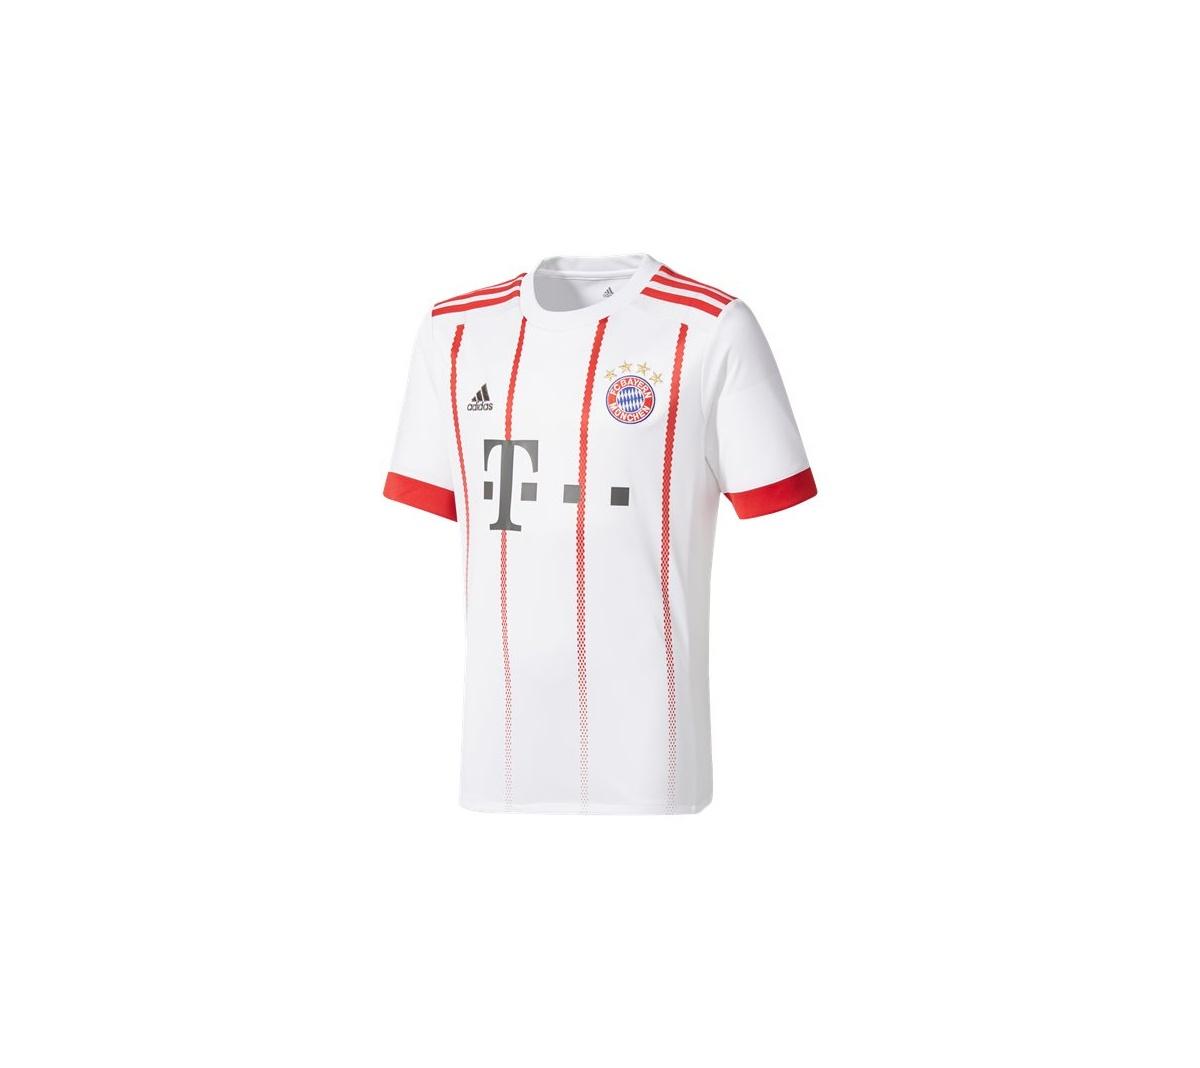 Camisa Adidas Bayern de Munique III Infantil 17/18